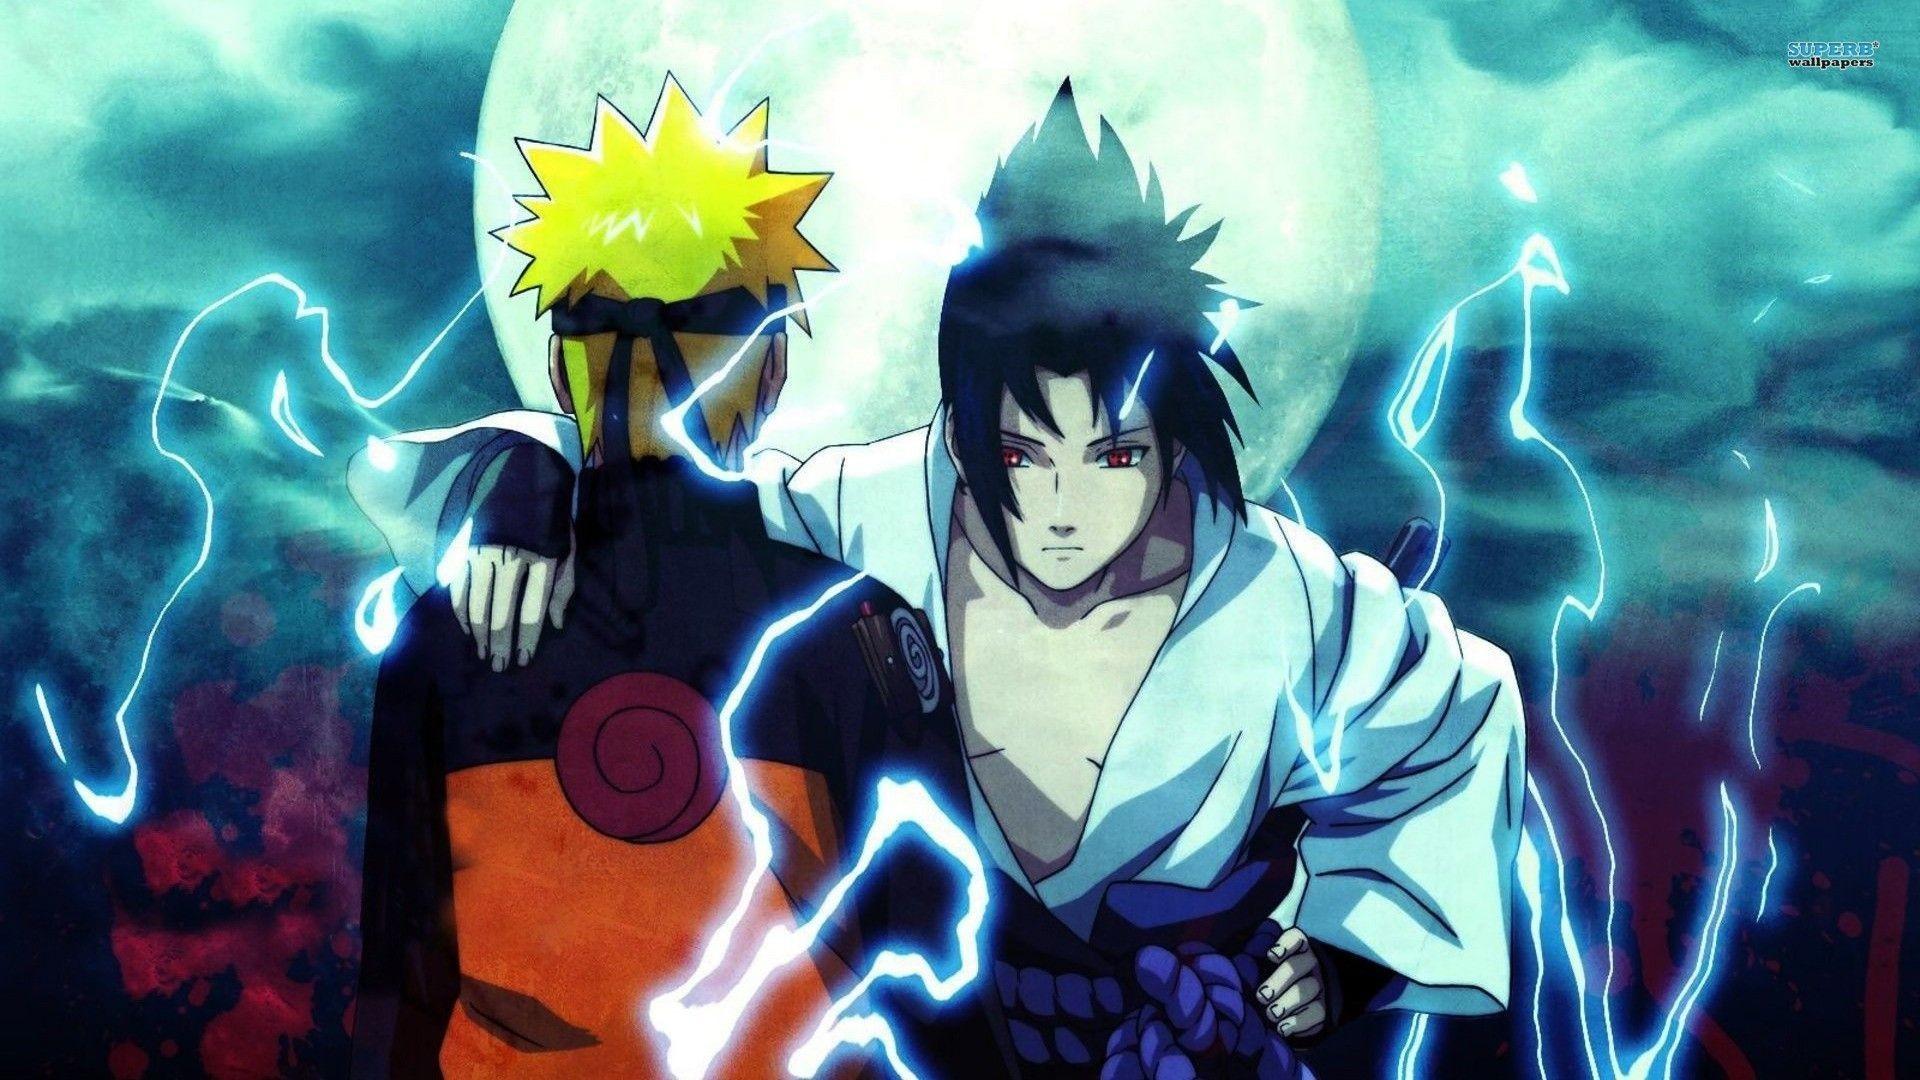 Hd Naruto Wallpapers 72 Images